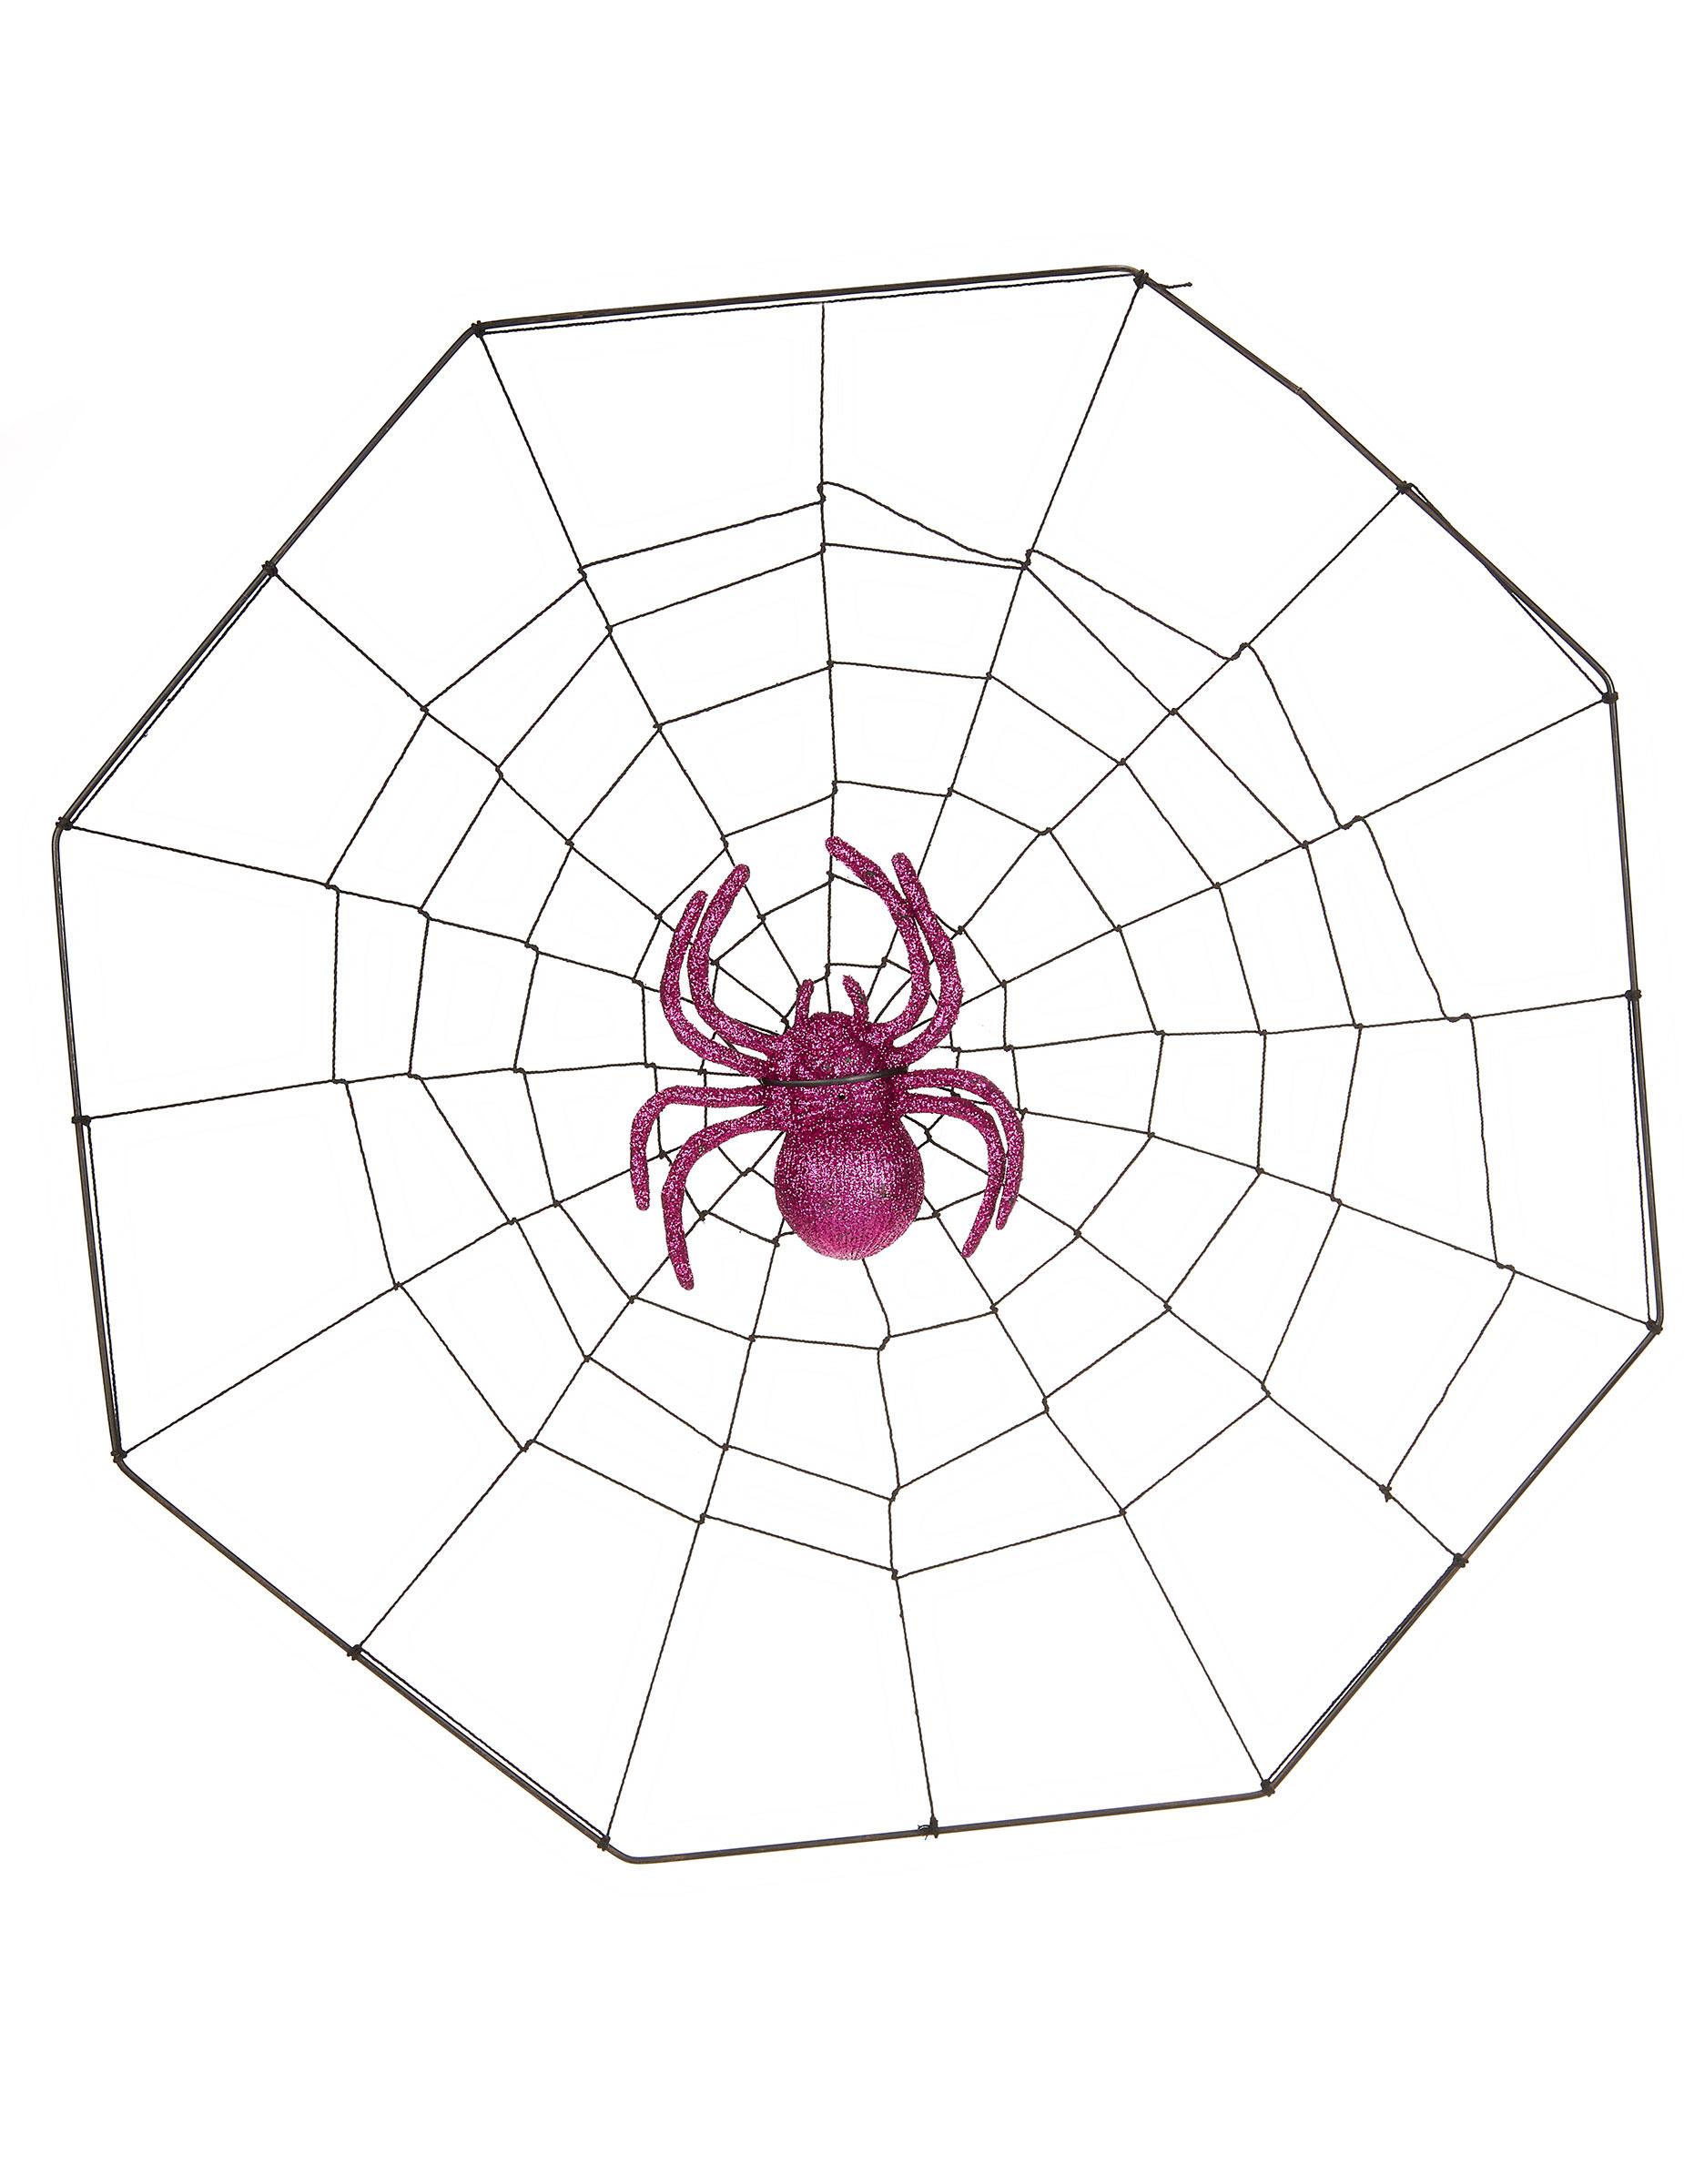 Toile d 39 araign e ventouse halloween deguise toi achat de decoration animation - Maquillage halloween toile d araignee ...